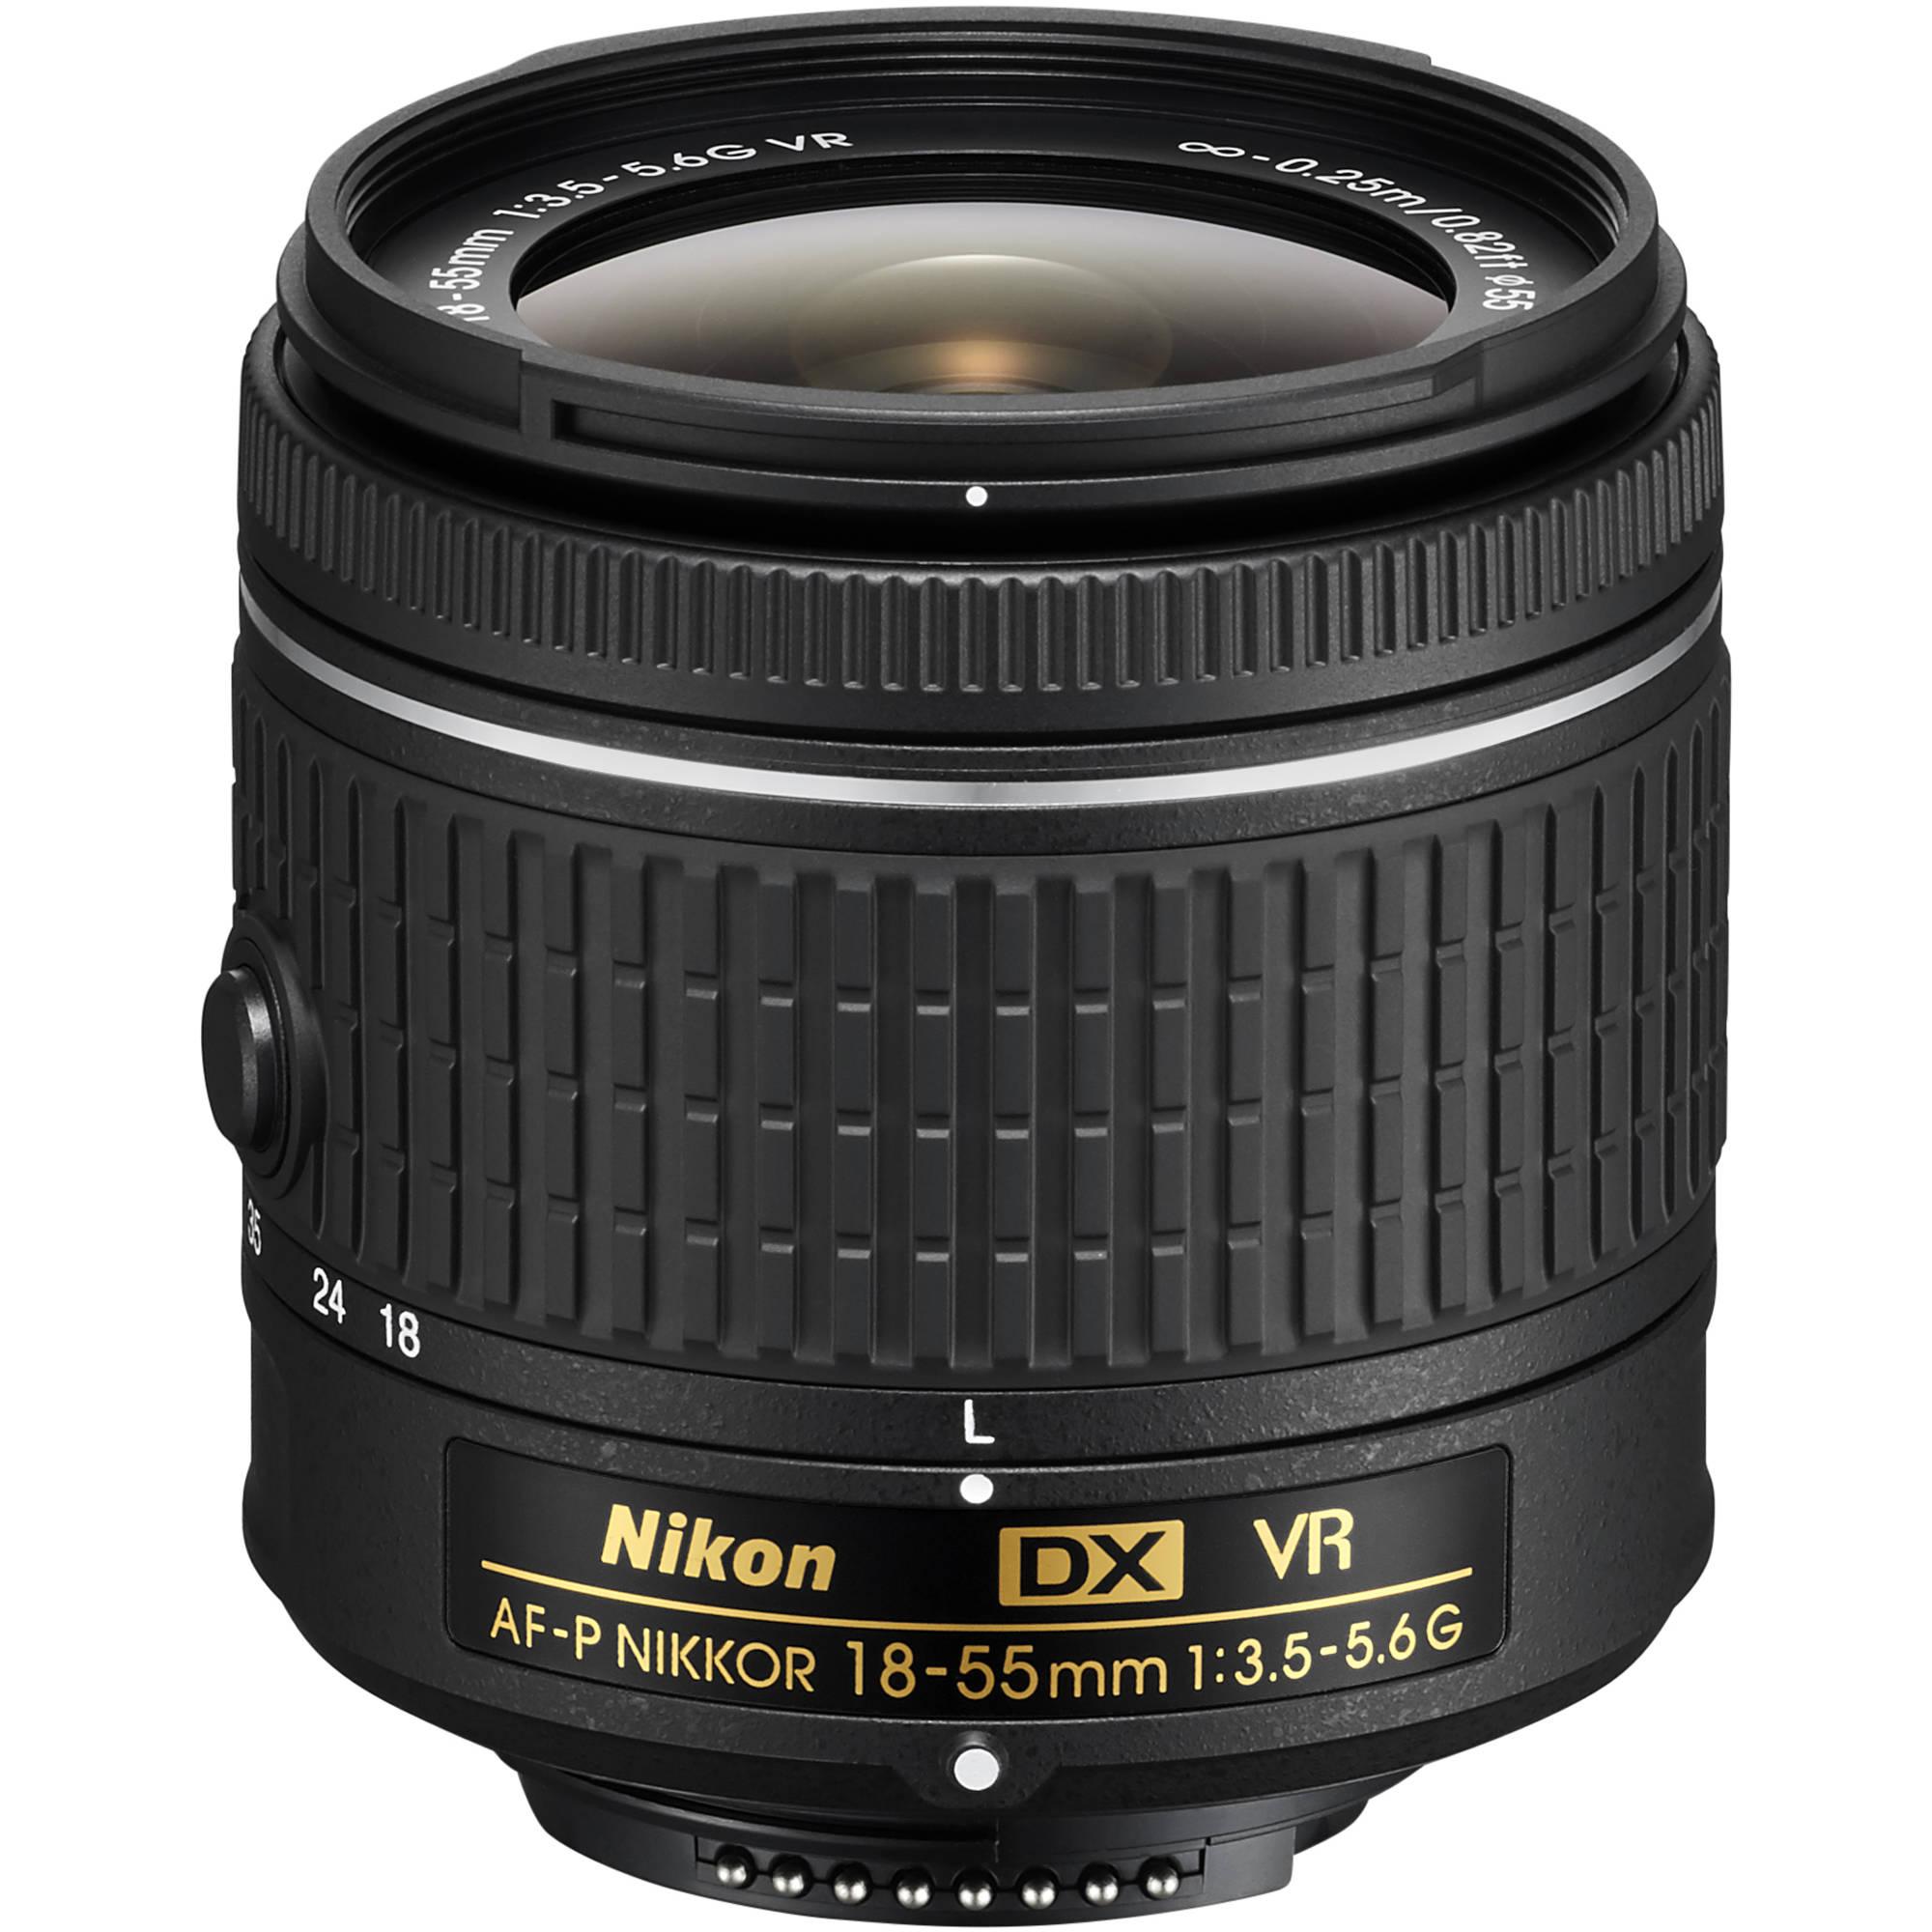 Nikon Af P Dx Nikkor 18 55mm F 3 5 5 6g Vr Lens 20059b B H Photo